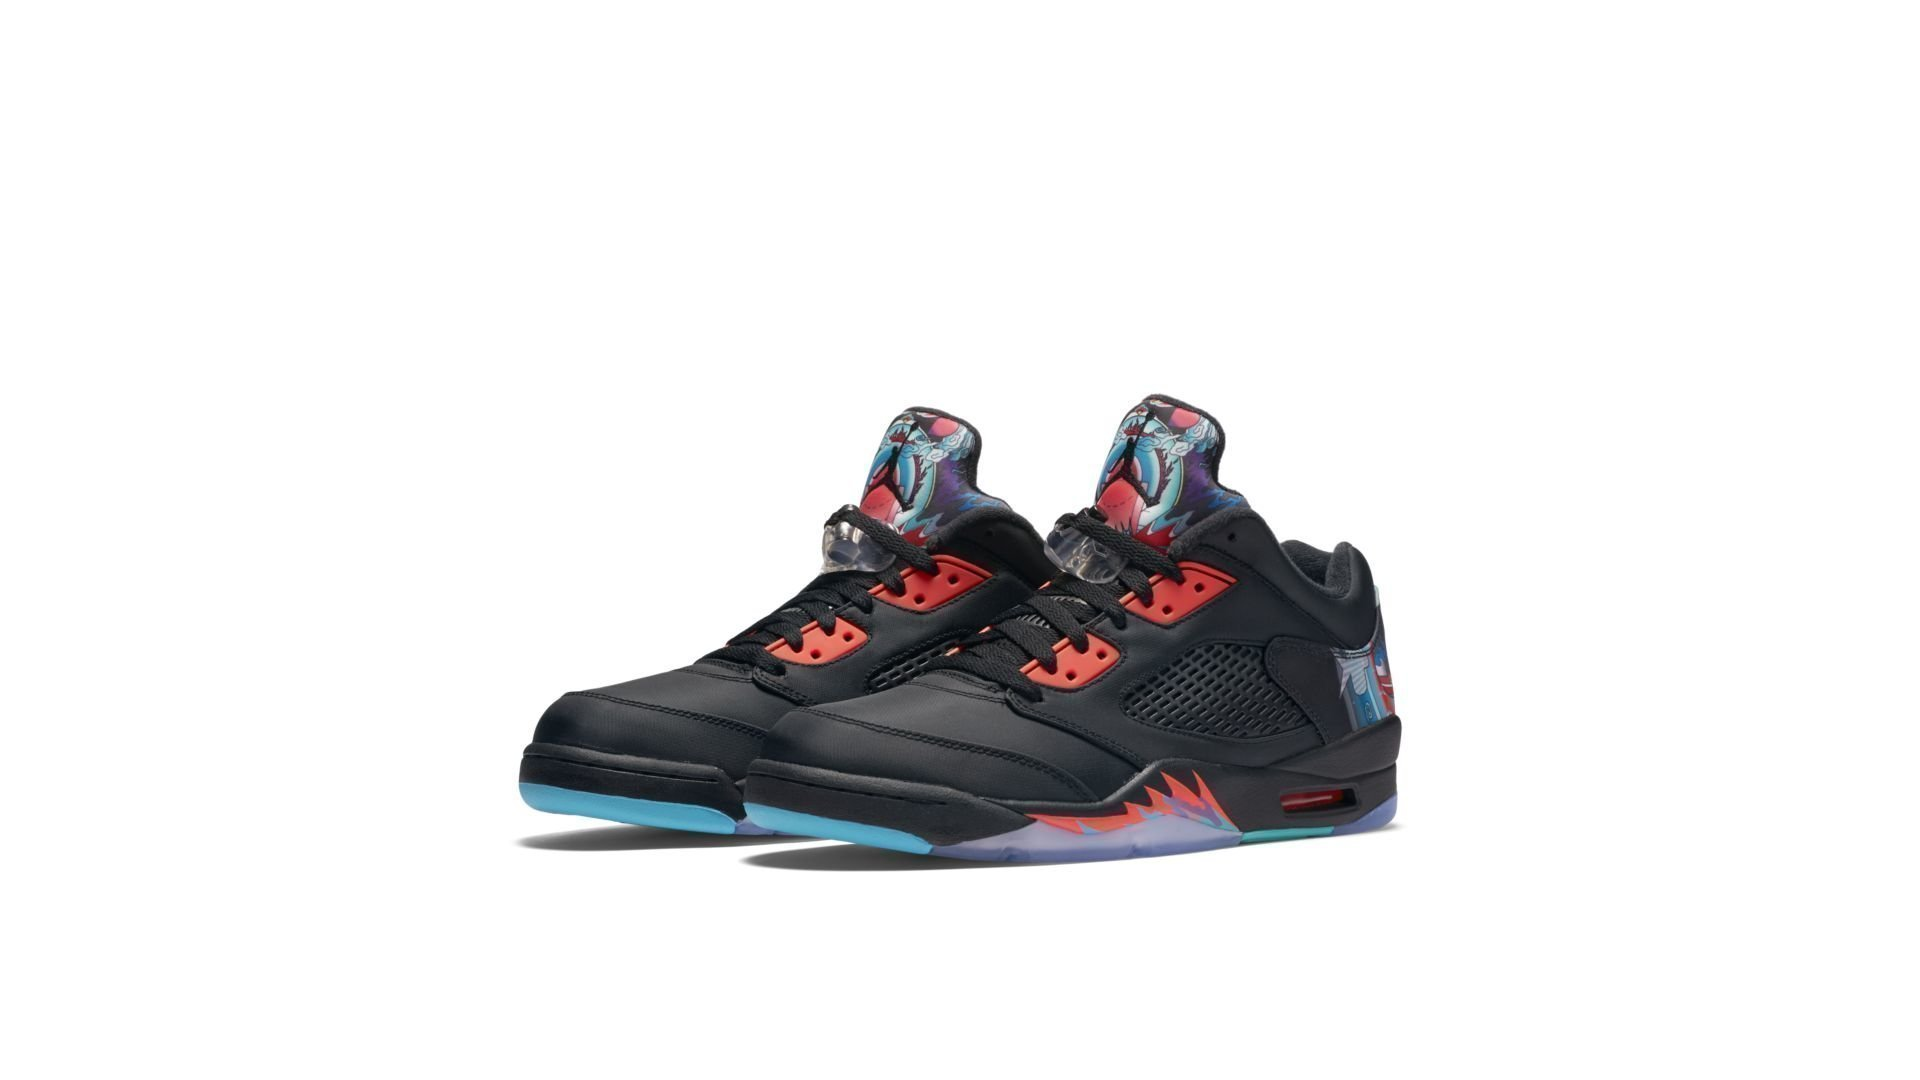 Jordan 5 Retro Low Chinese New Year (840475-060)